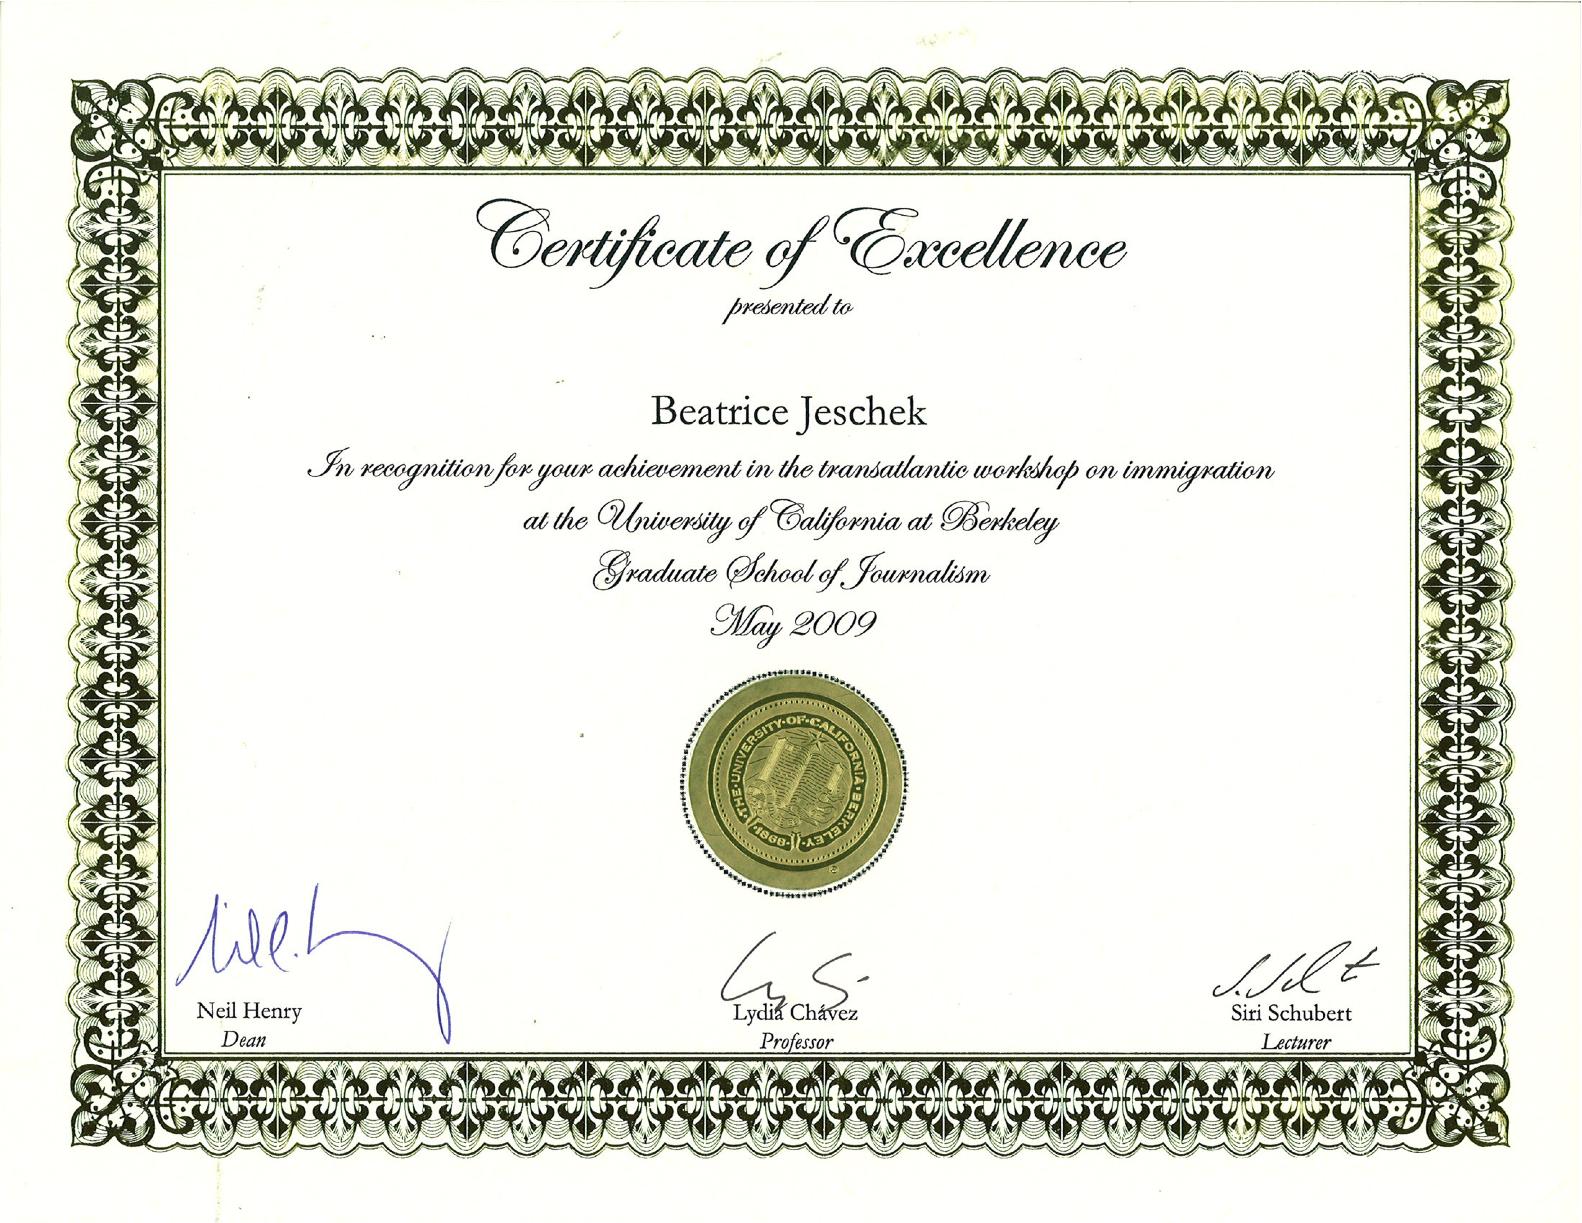 Beatrice Barnwell (Jeschek): Berkeley Certificate of Excellence